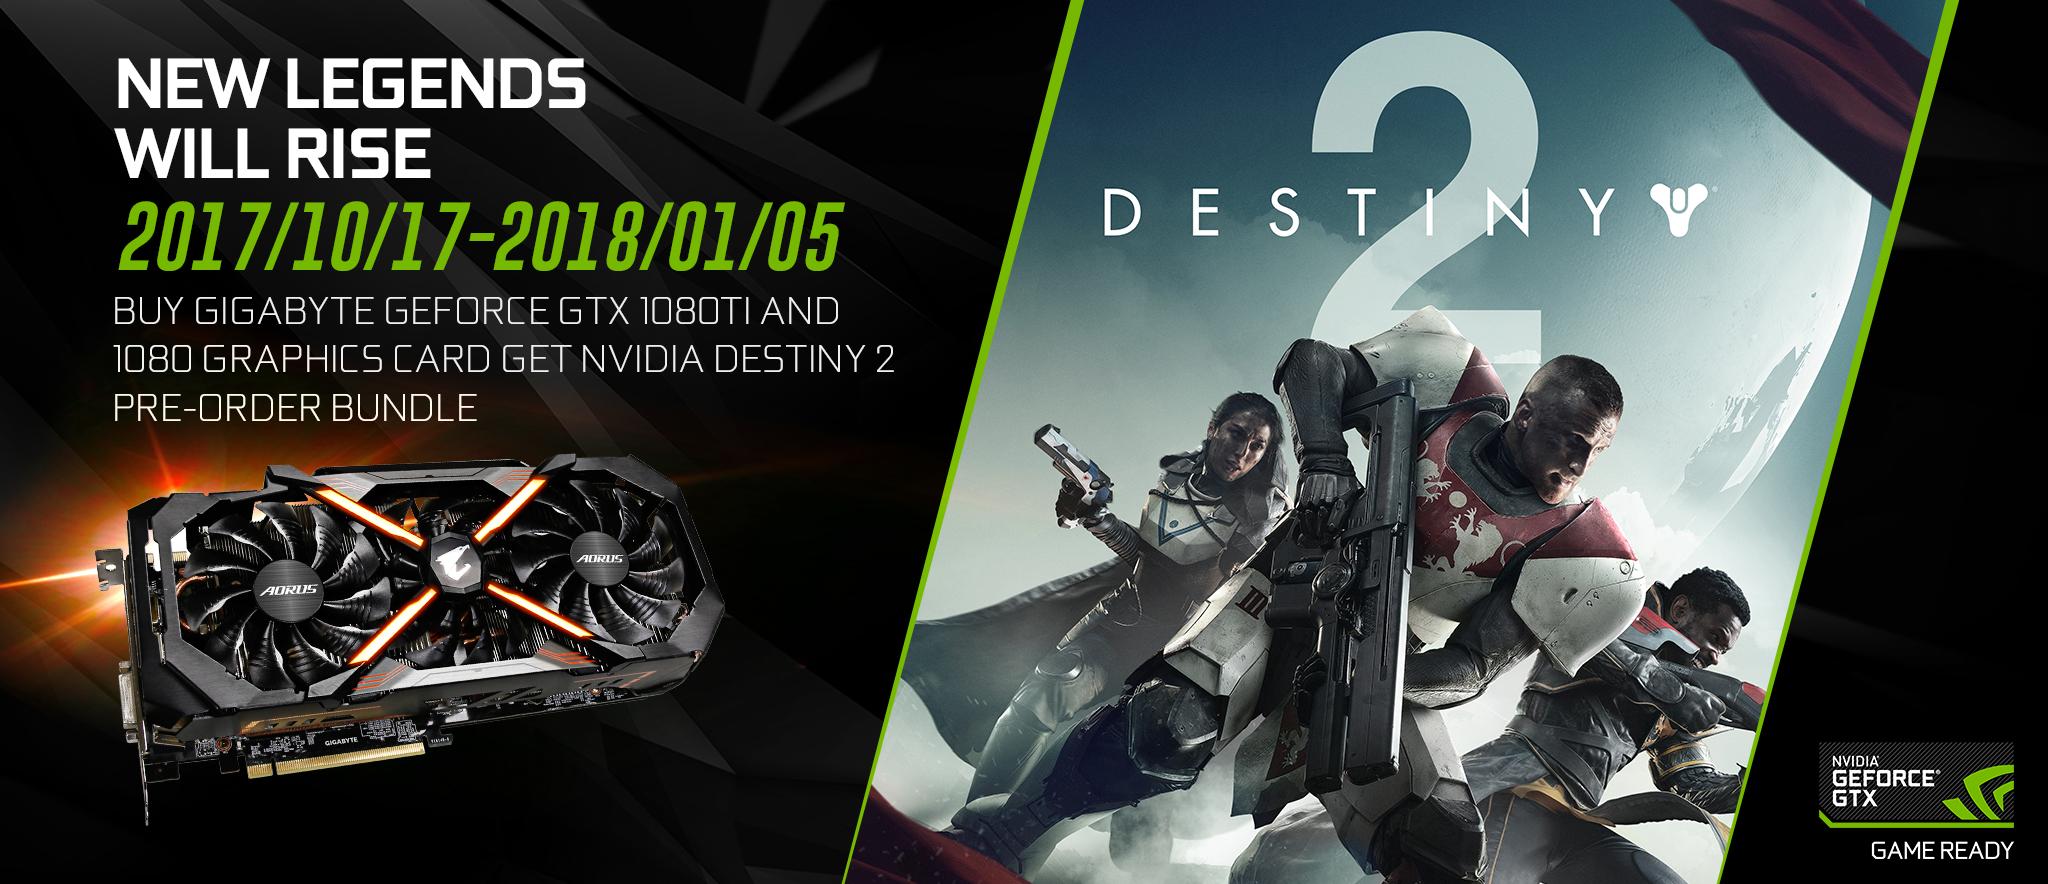 Destiny 2 1080ti